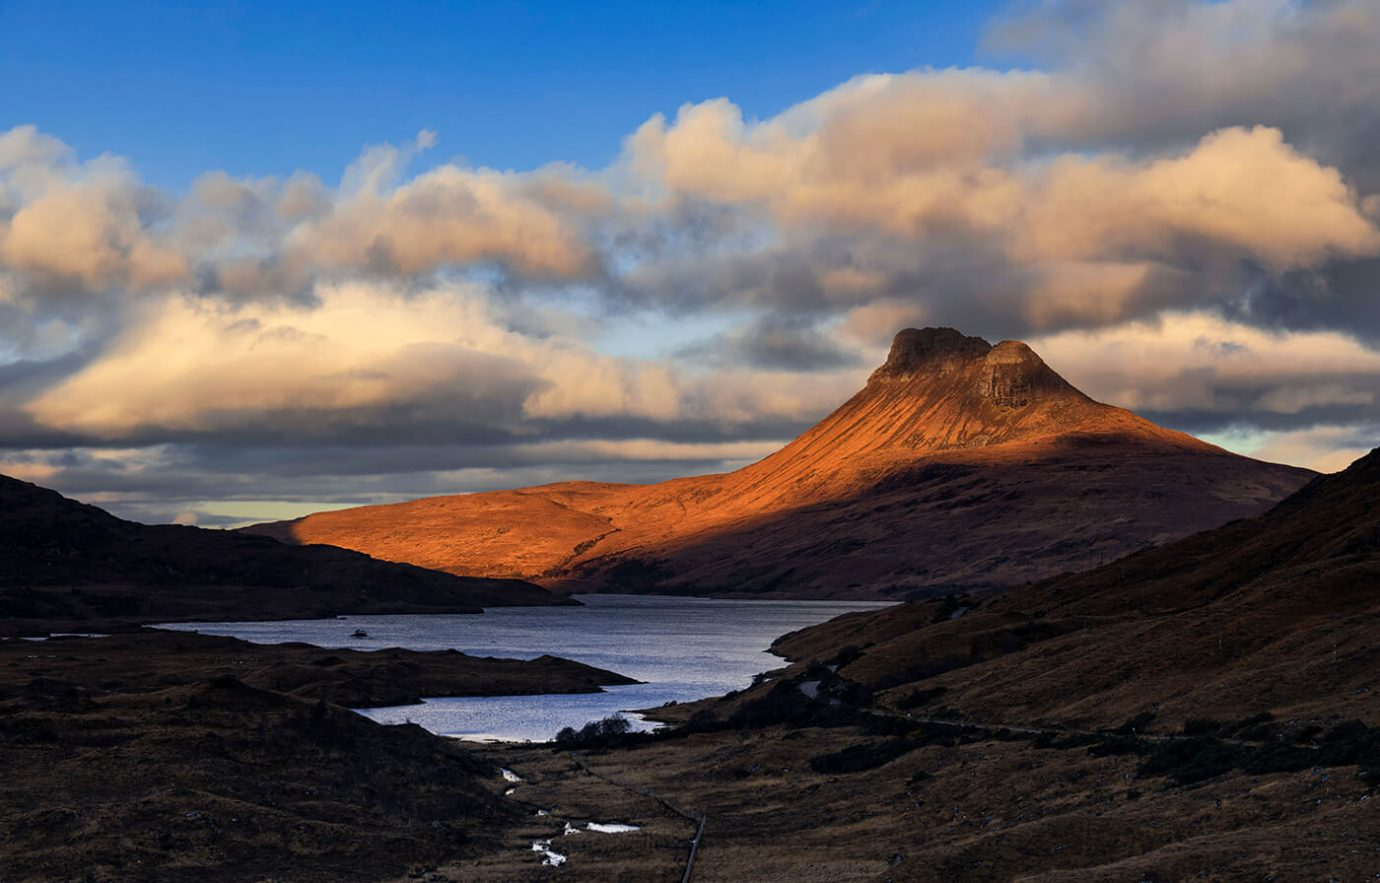 Sunrise, Stac Pollaidh, Assynt, Scotland